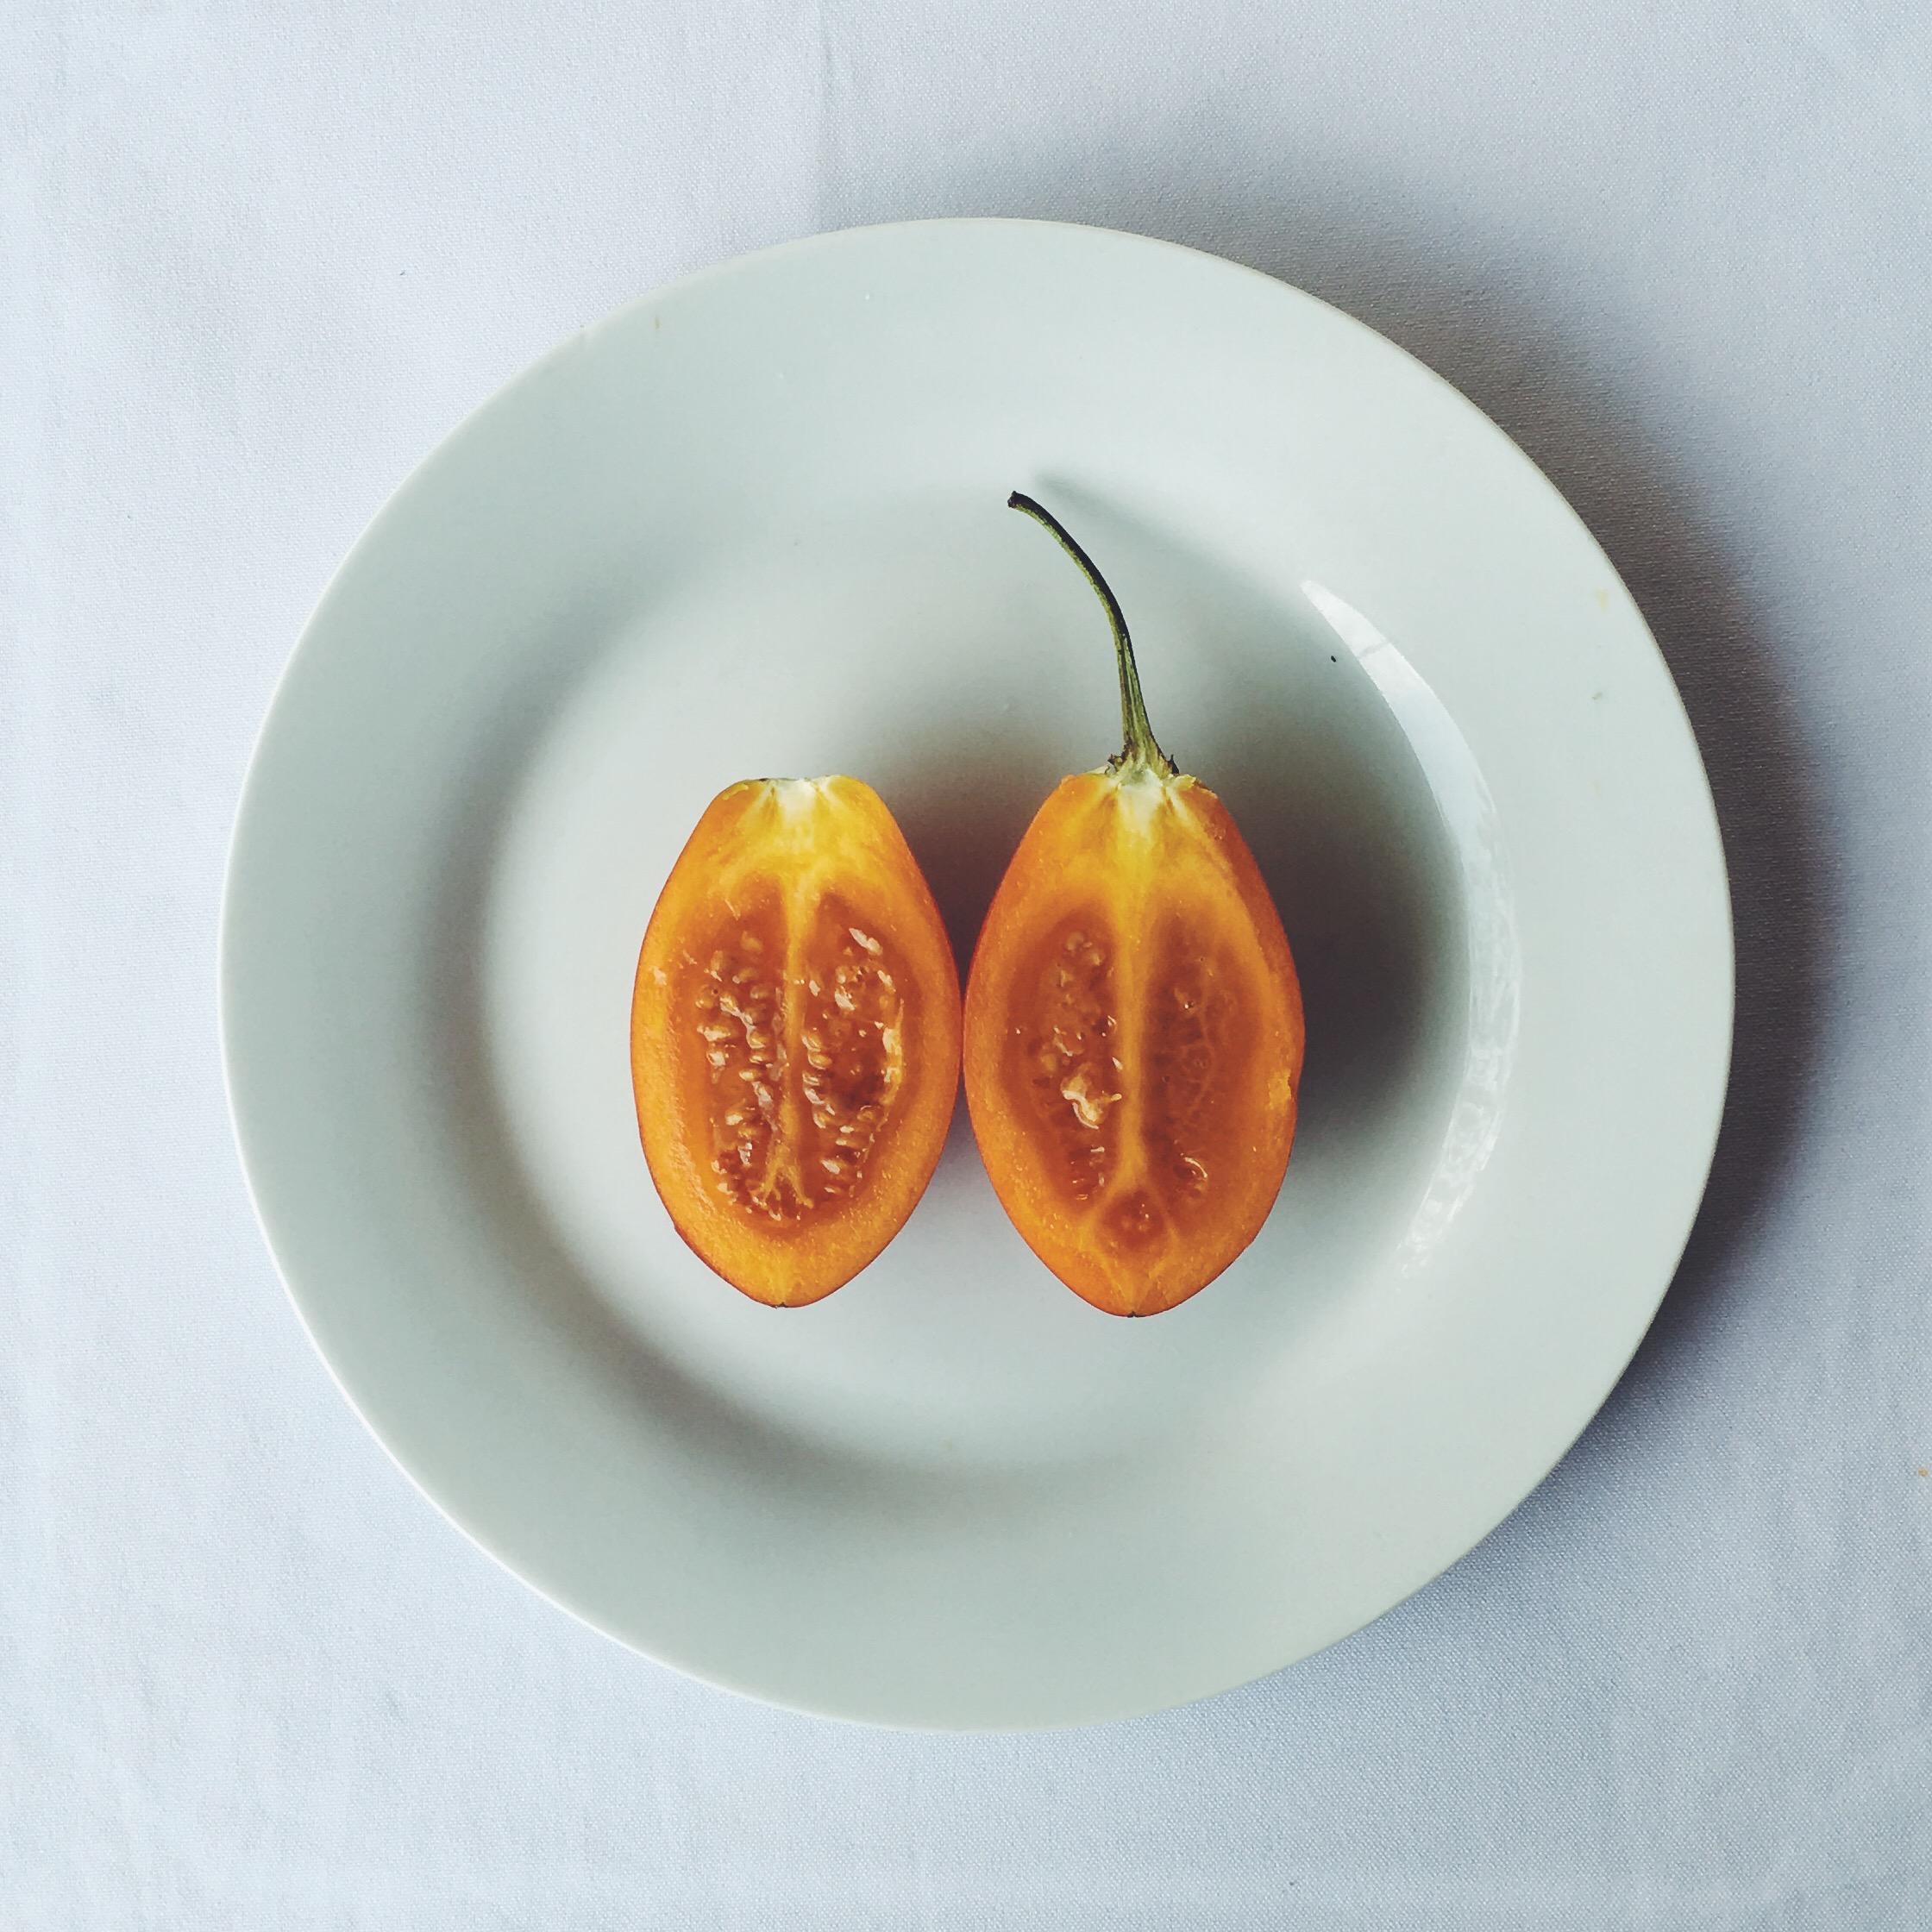 OBELO | Tomate de Arbol